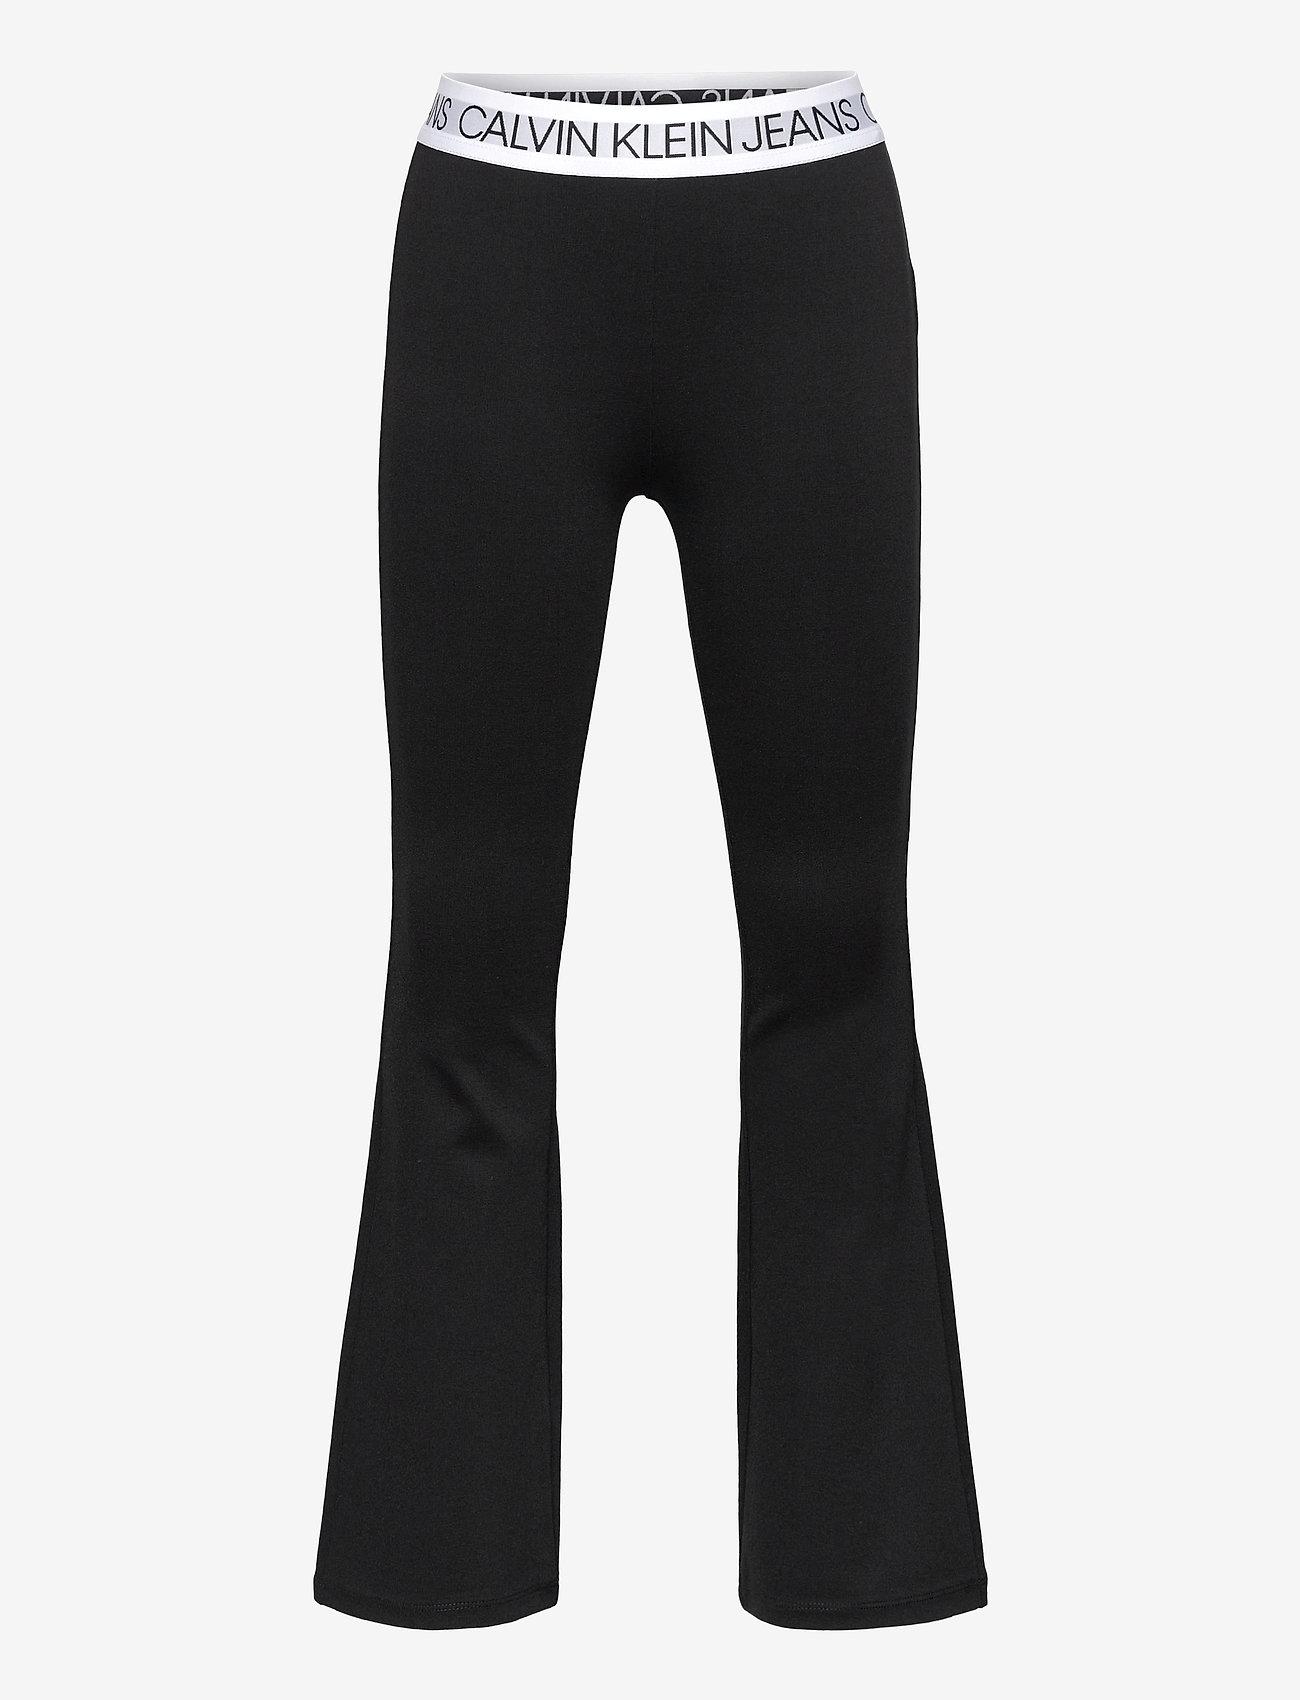 Calvin Klein - LOGO WAISTBAND PUNTO PANTS - trousers - ck black - 0